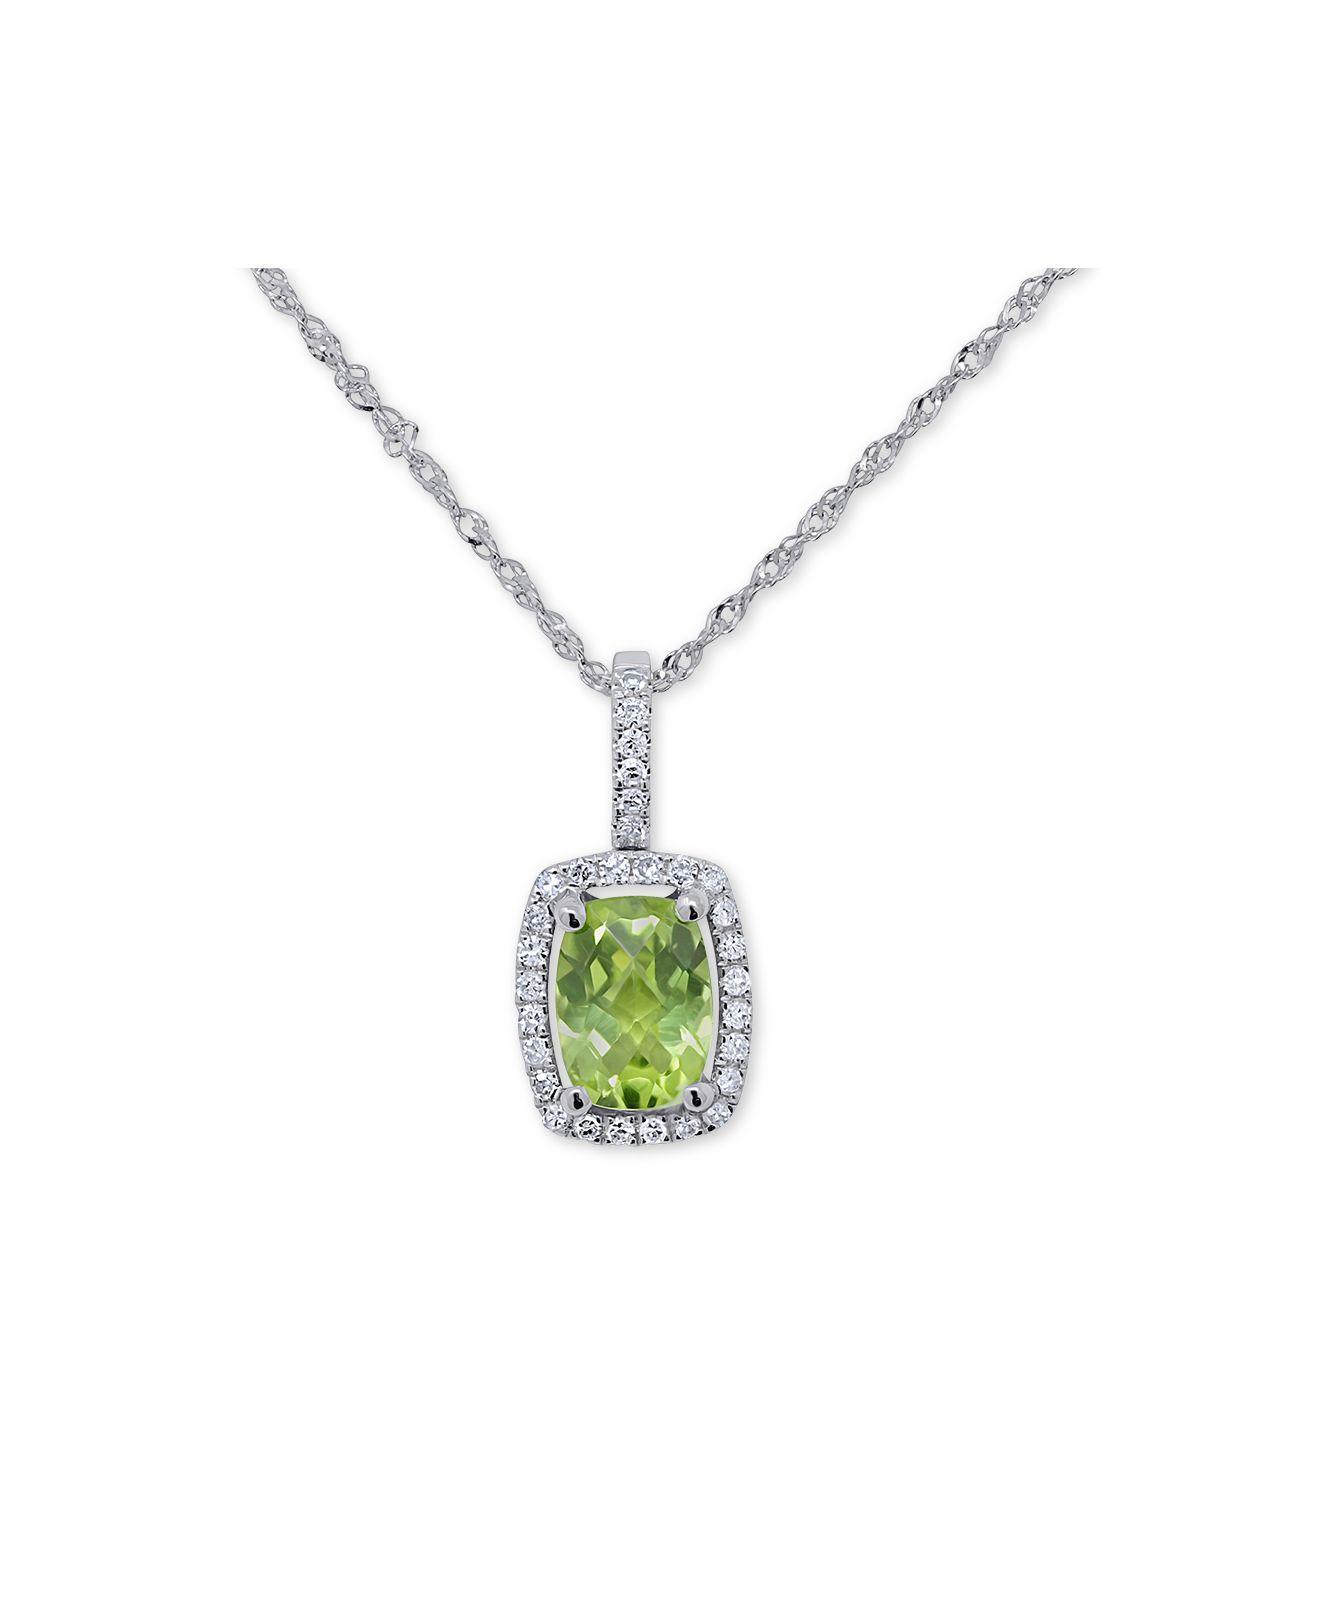 DiamondJewelryNY Silver Pendant SS Crystal Birthstone BOY-April